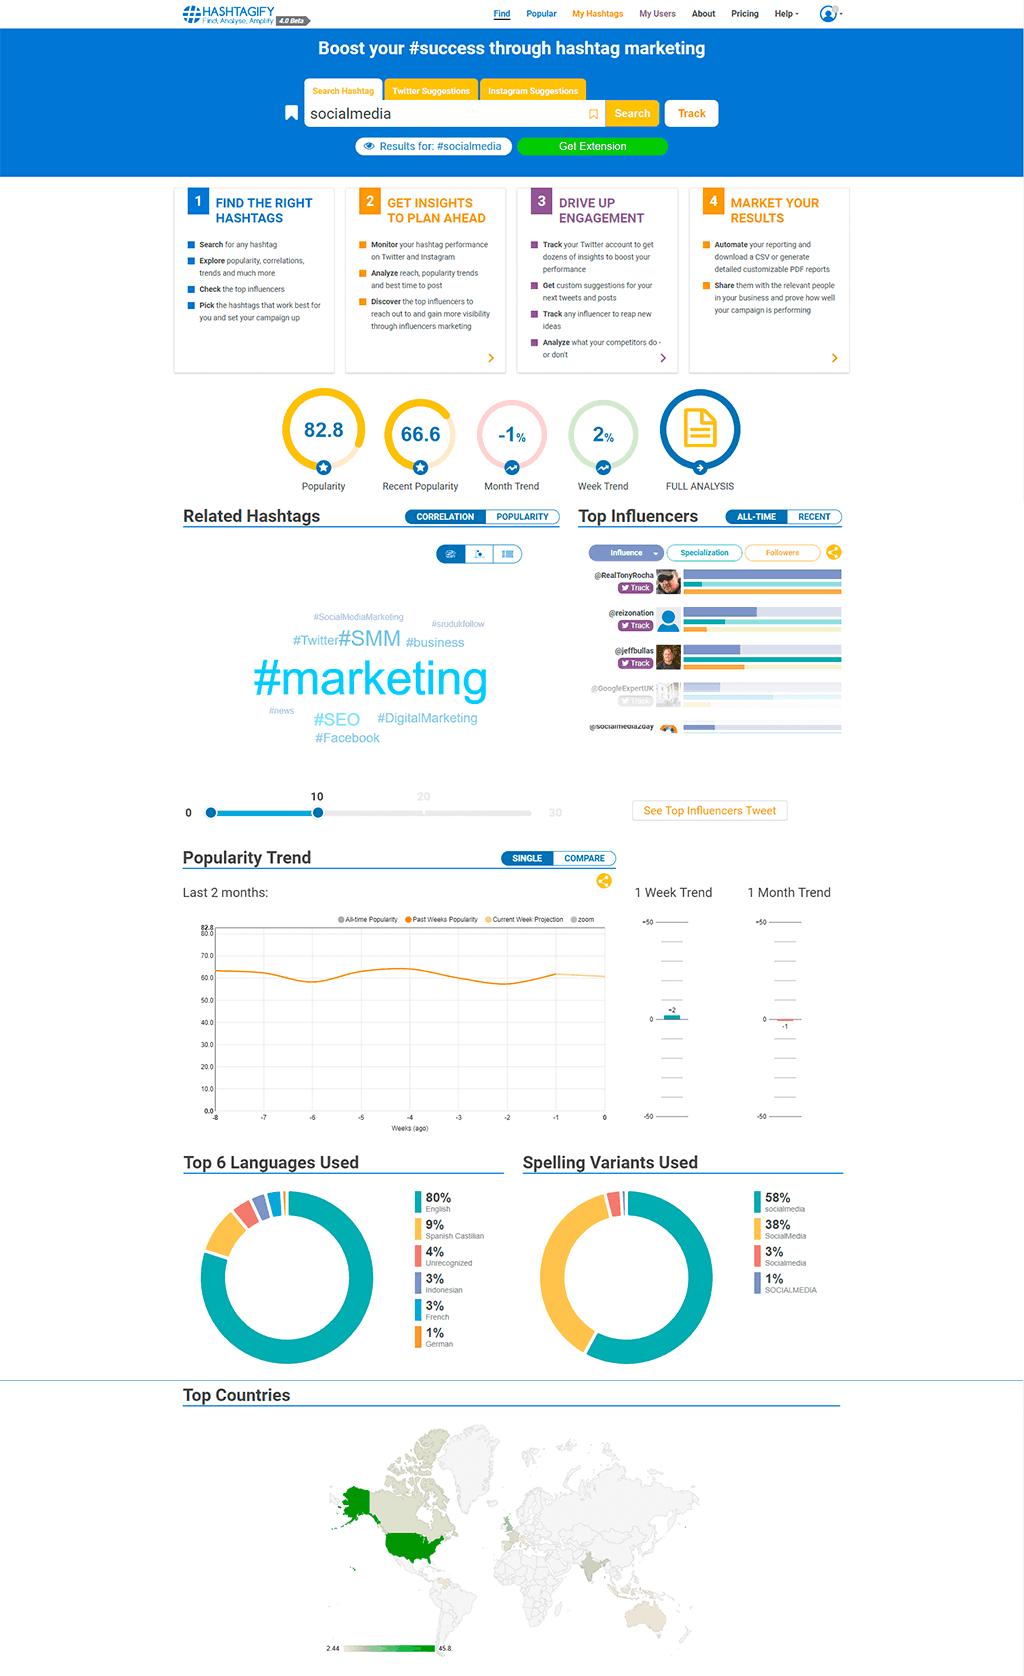 Search Hashtag - Hashtagify